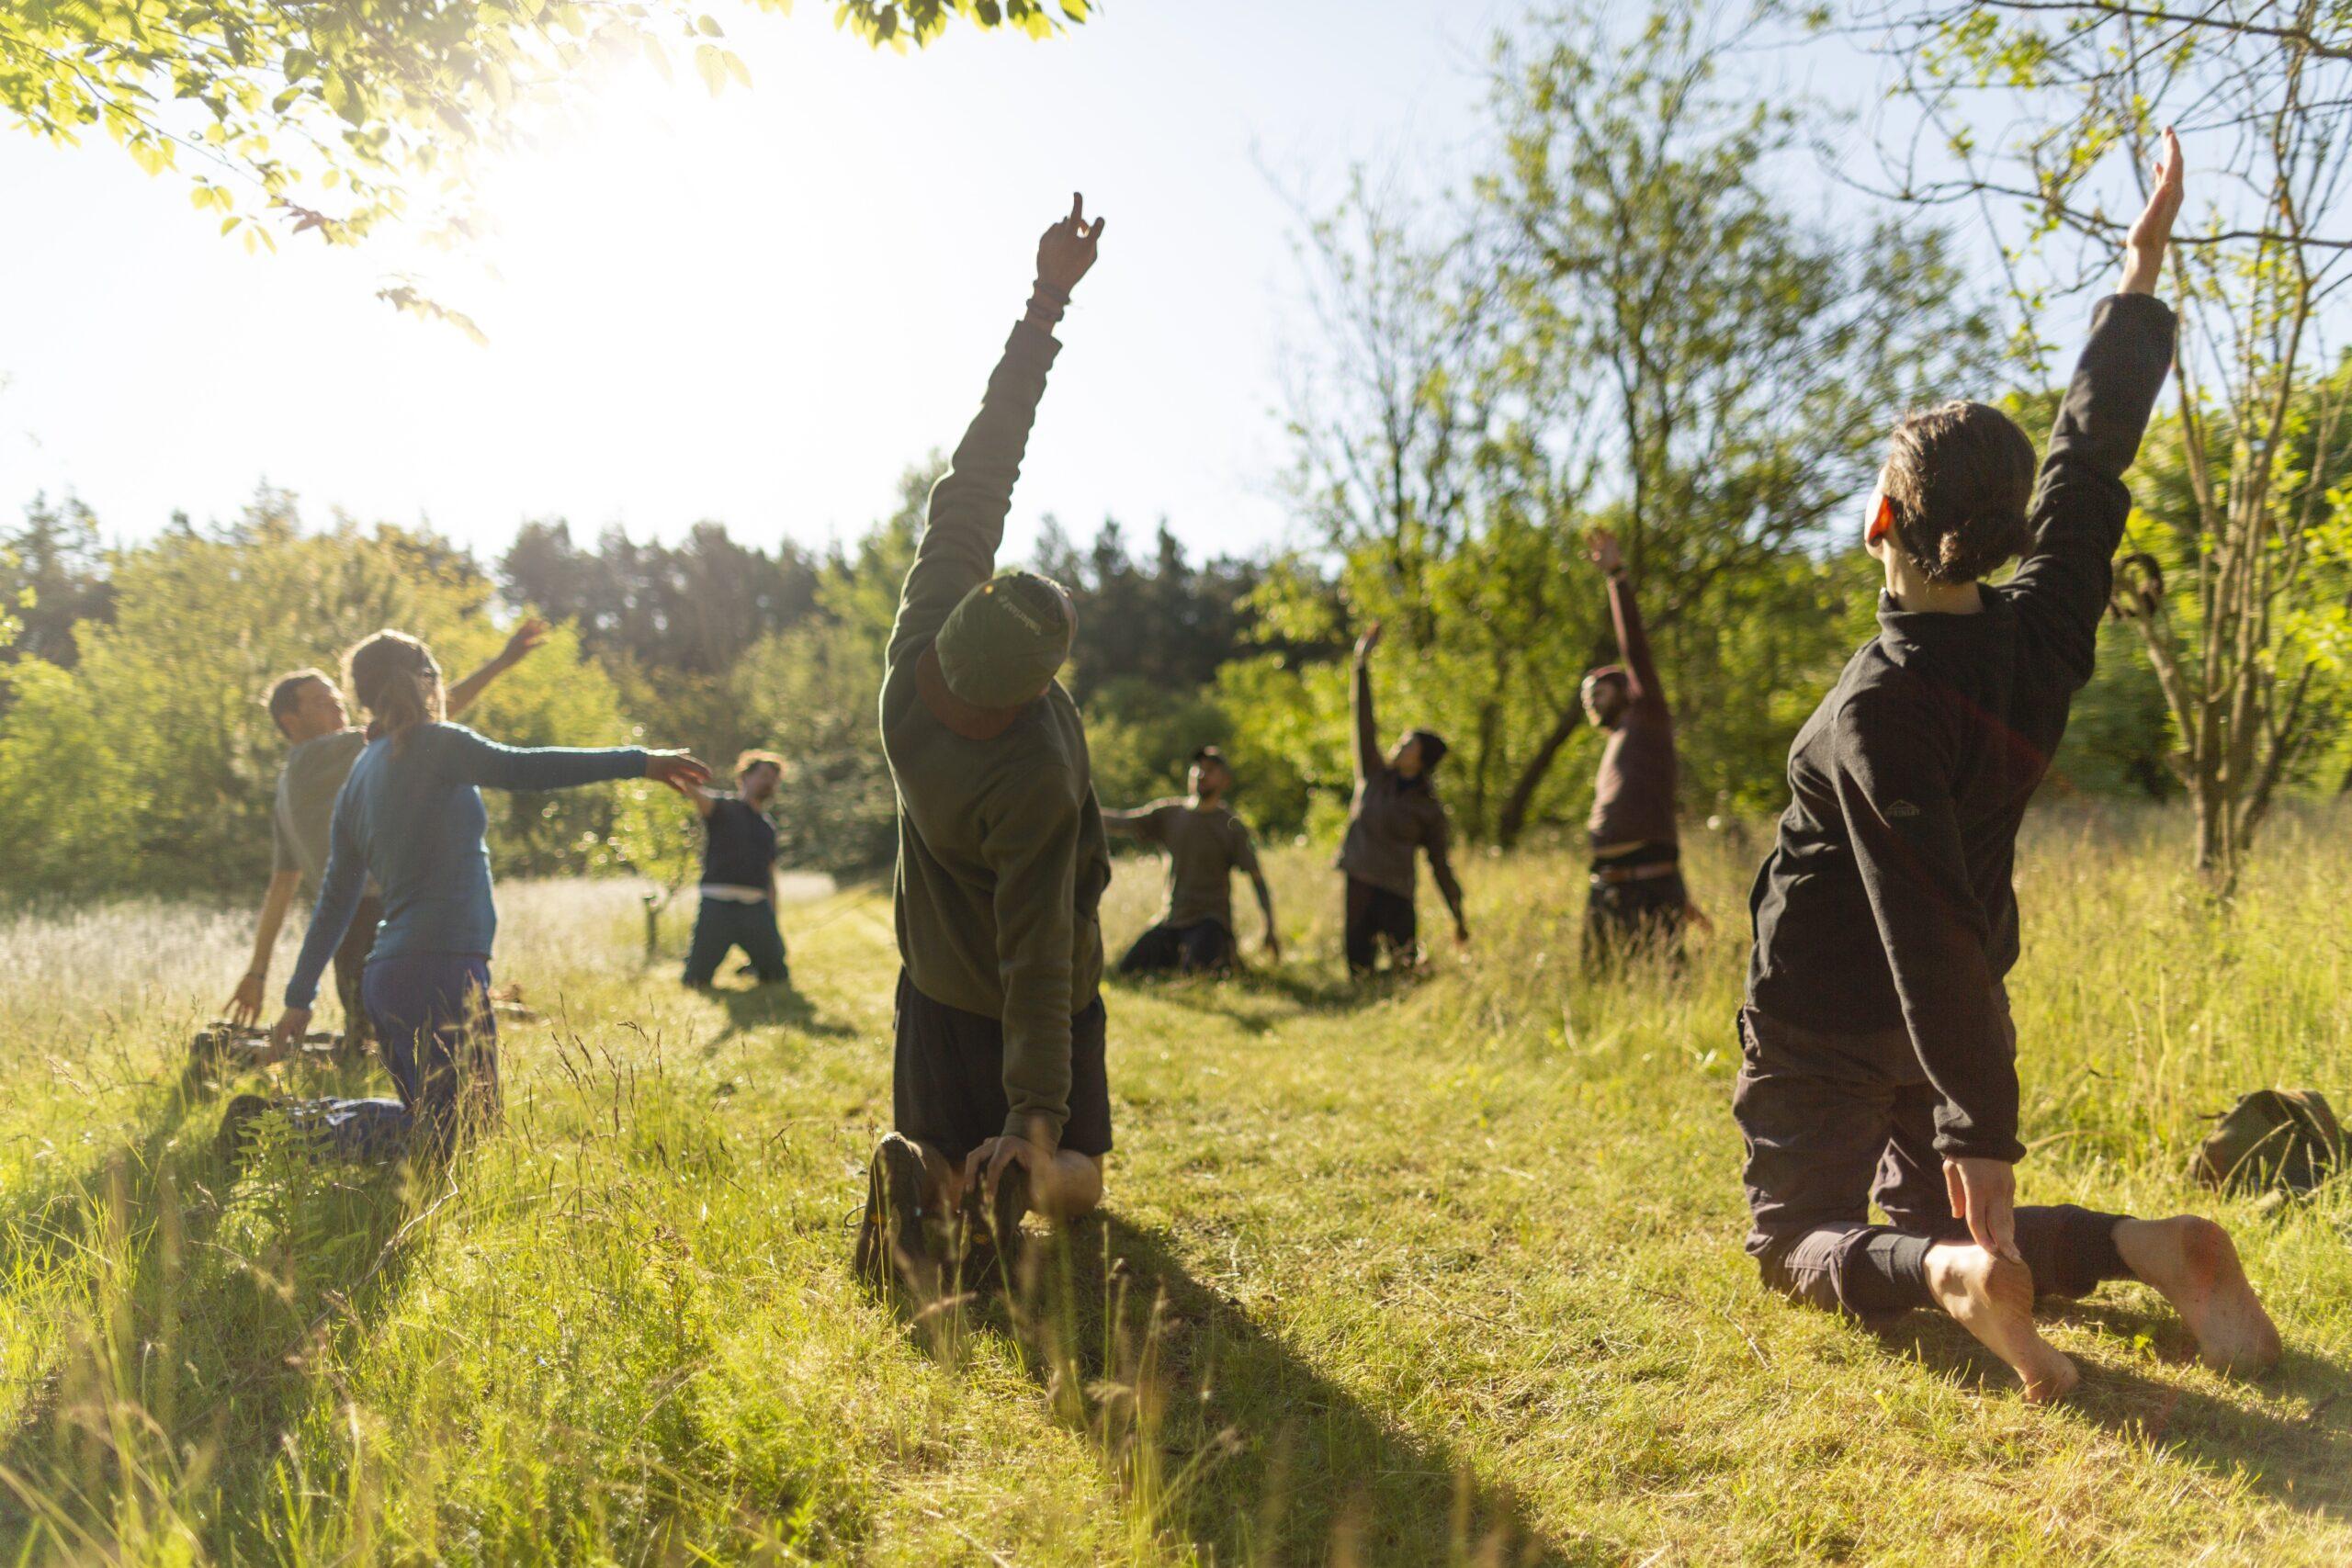 Wildnispädagogik-Ausbildung: Morgensport